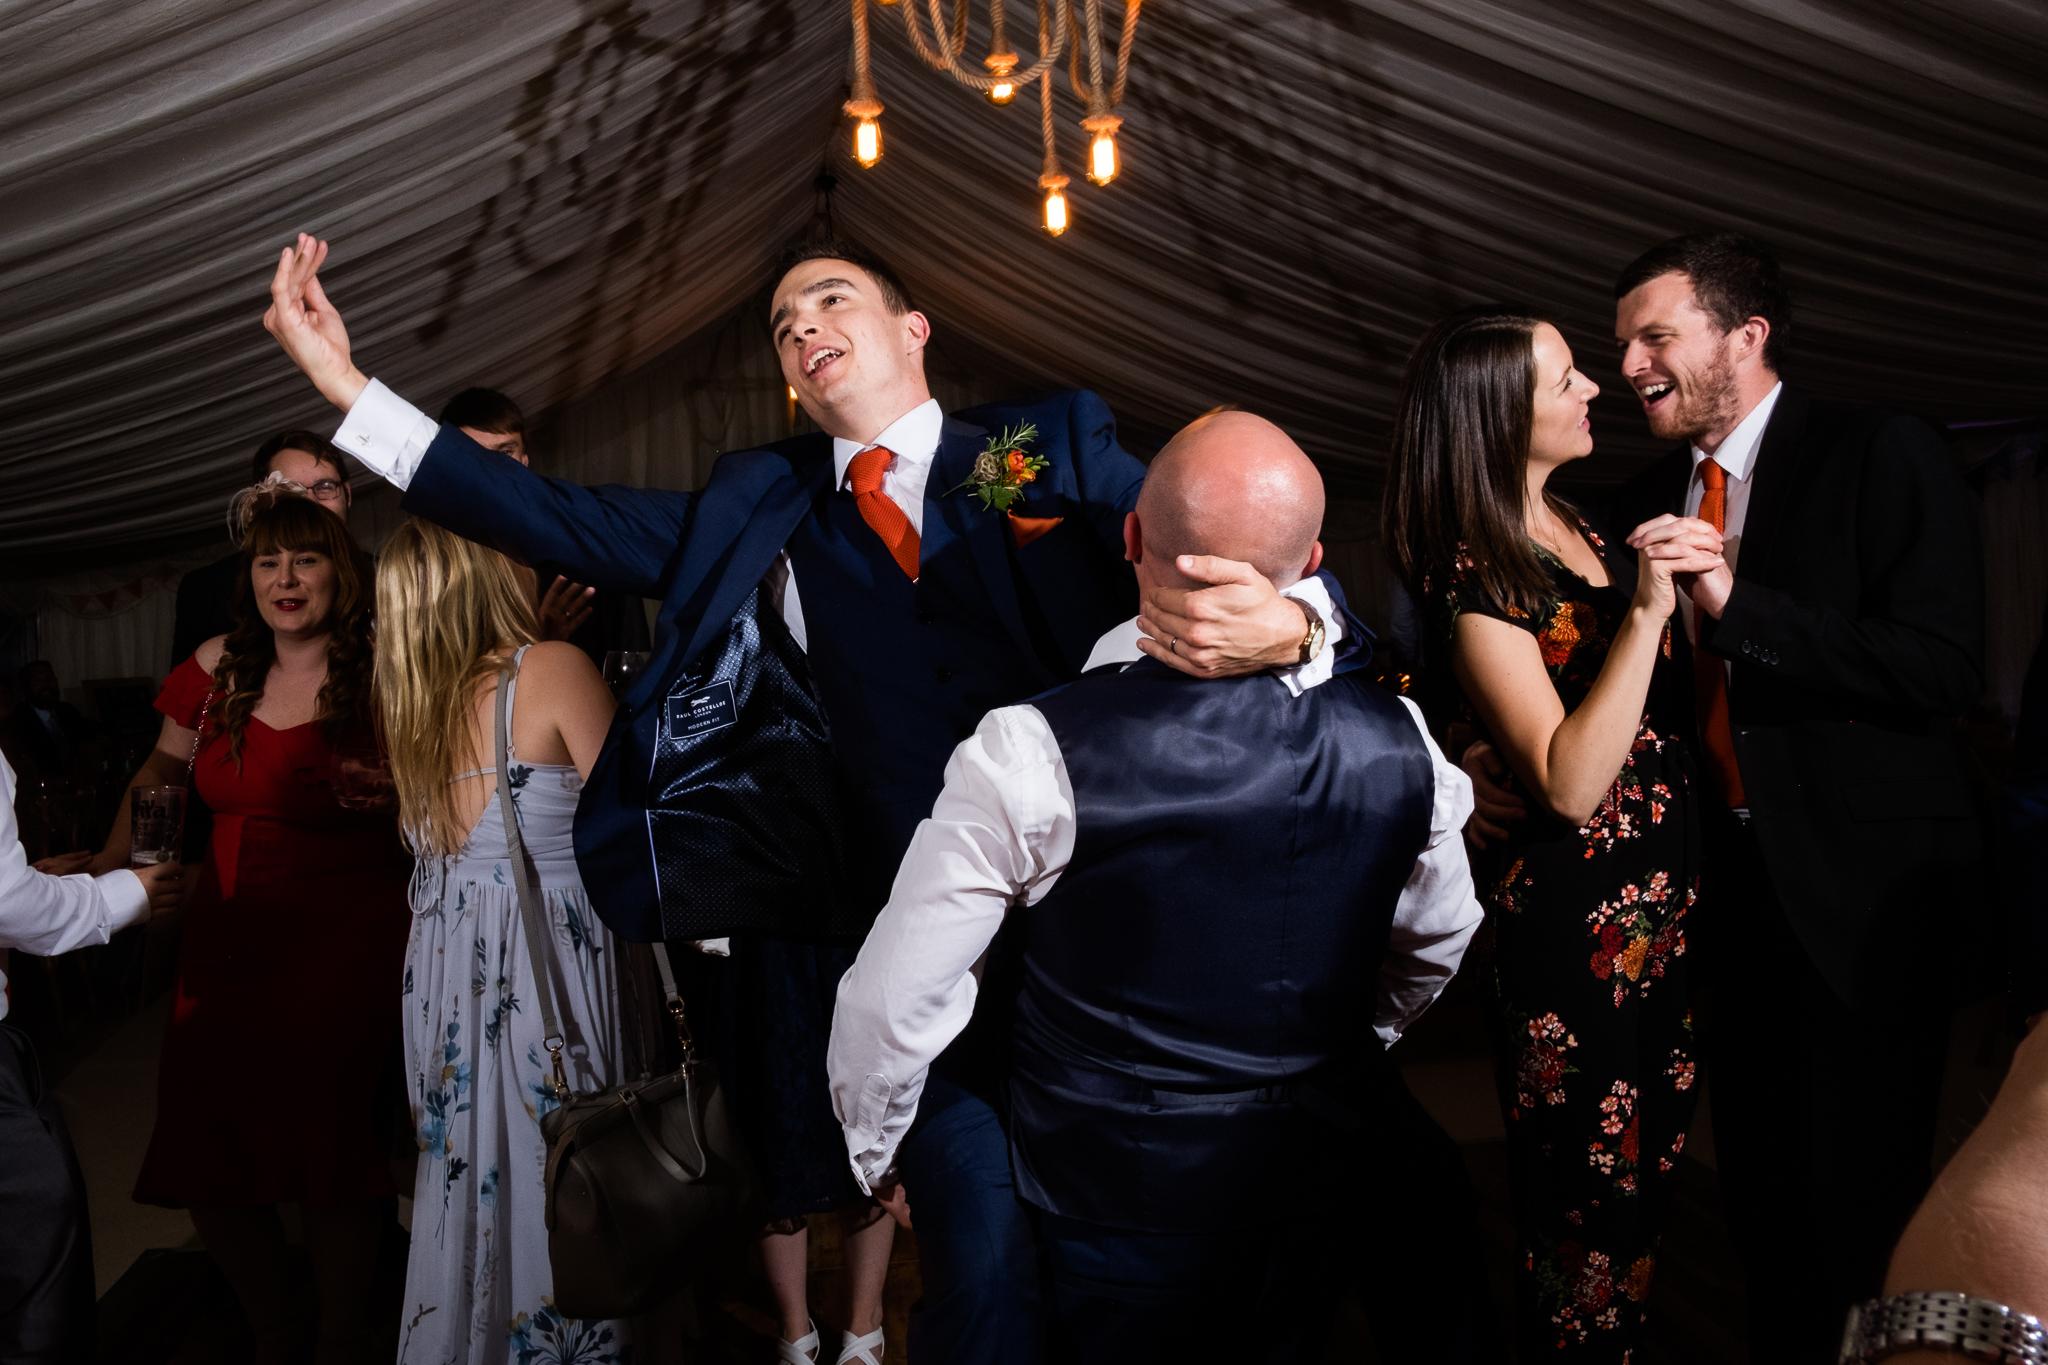 Relaxed Documentary Wedding Photography at The Wizard Inn, Alderley Edge Cheshire - Jenny Harper-89.jpg